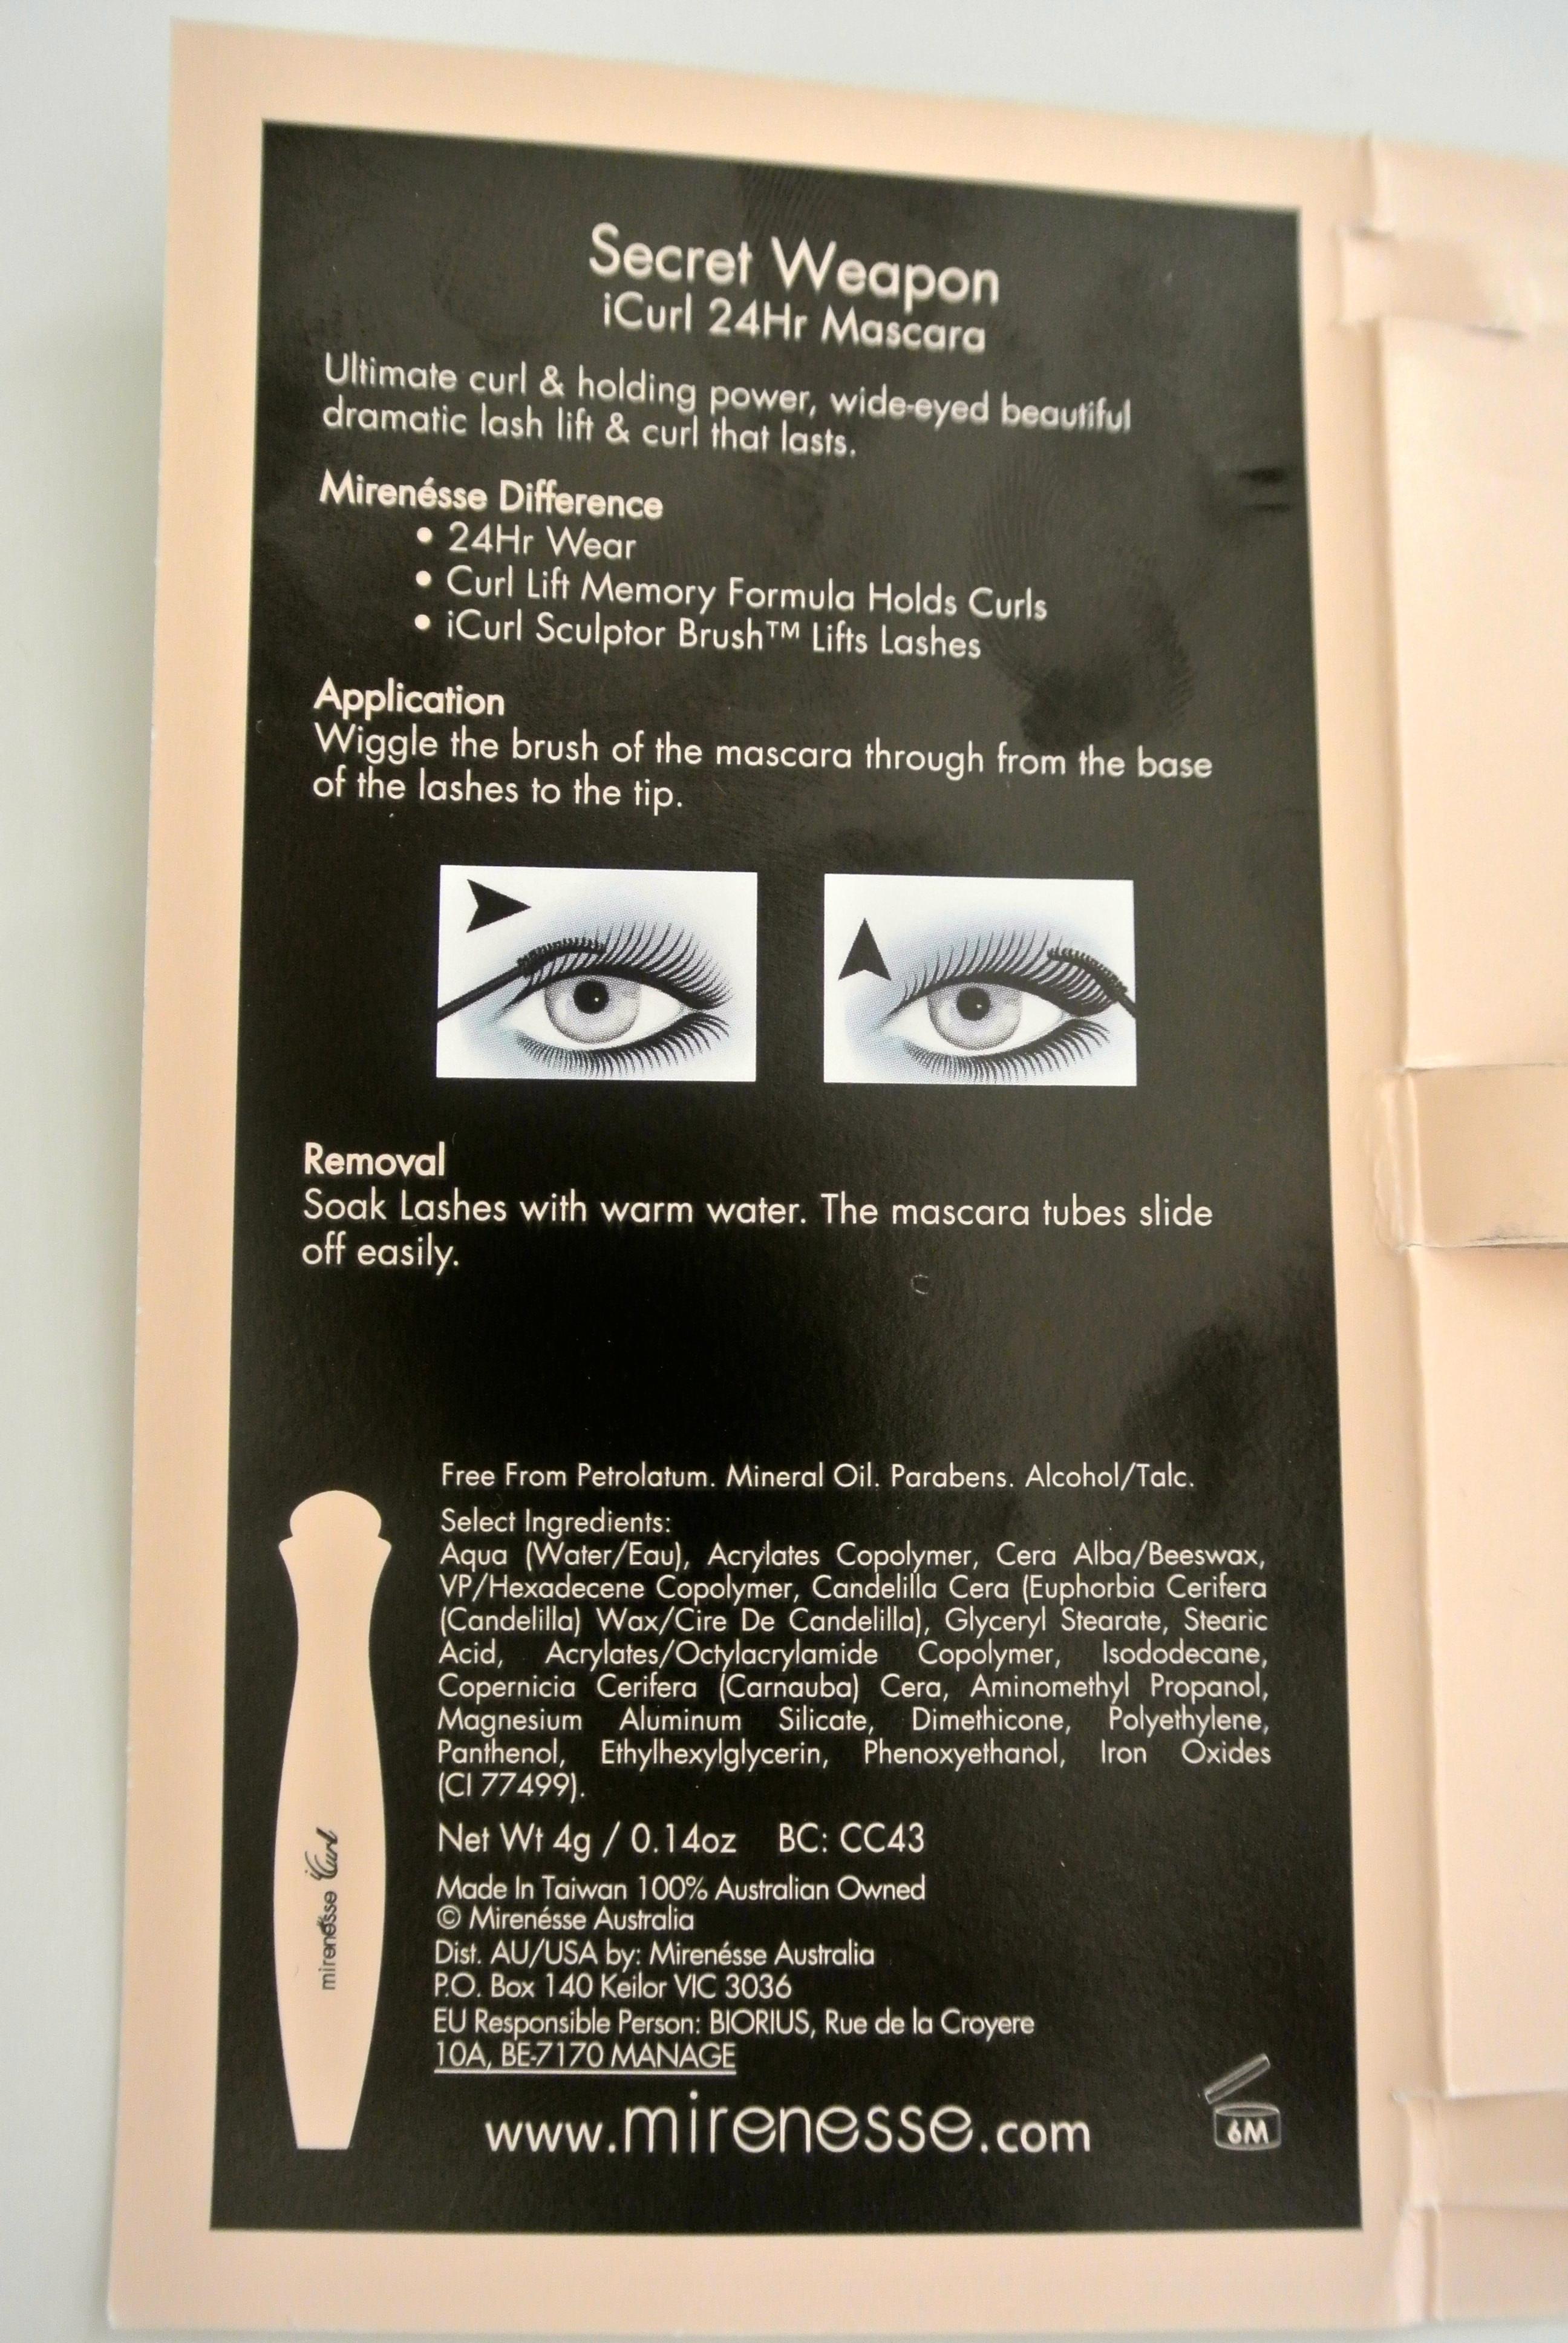 Mirenesse Secret Weapon iCurl 24Hr Mascara Review - AmandaPhenomenon